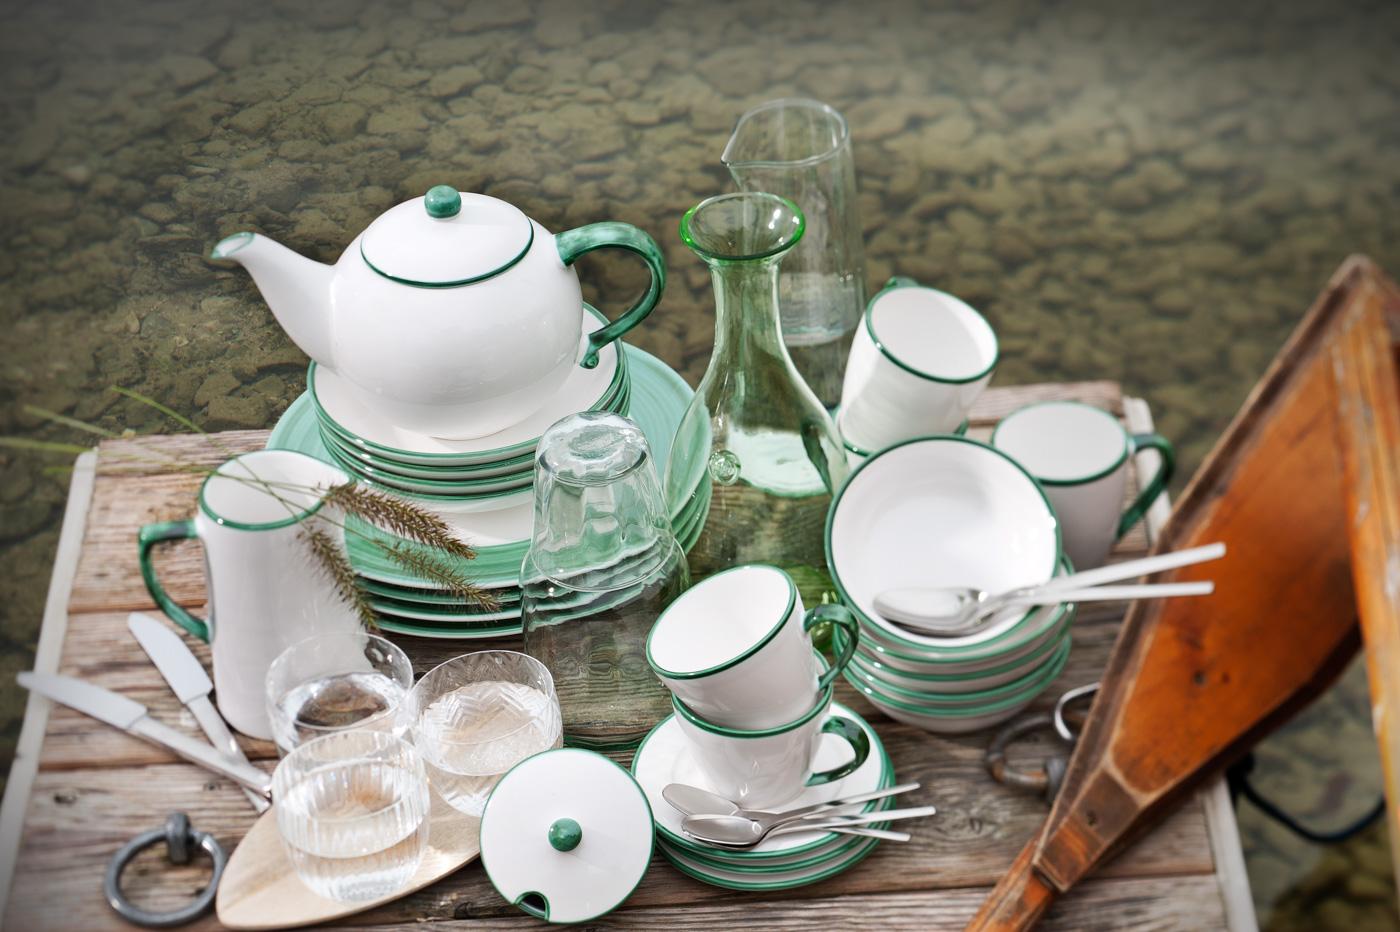 Gmundner Keramik mit grünem Rand, Kaffeszene auf Holzsteg am See